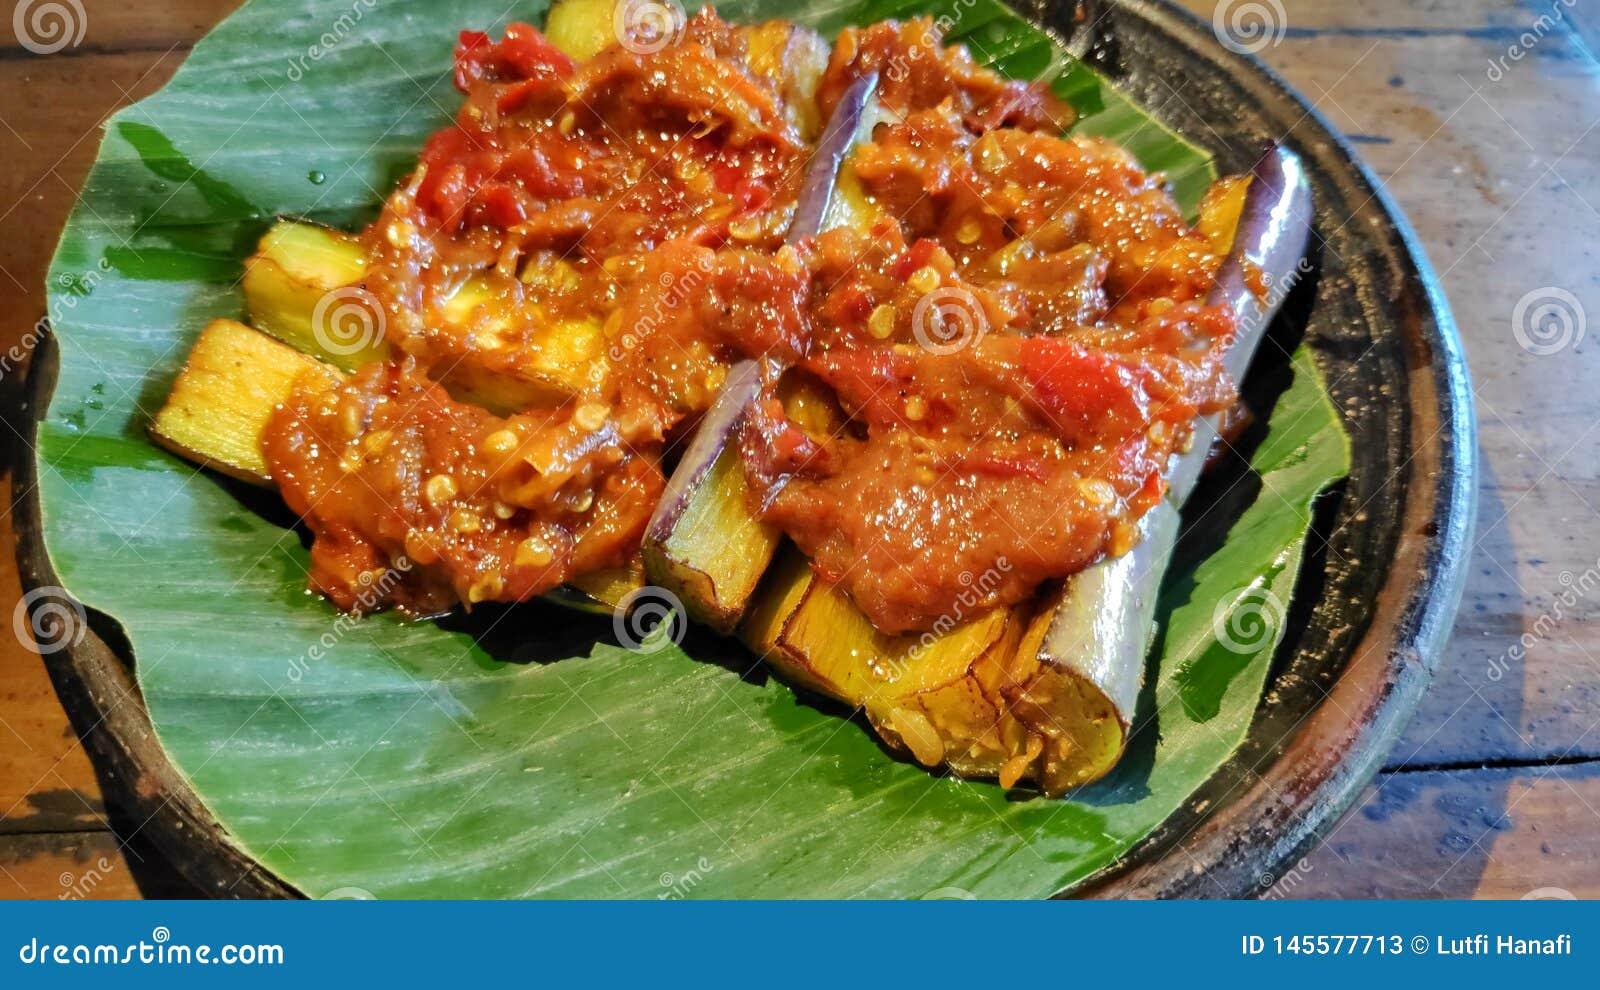 Eggplant chili sauce on a pottery plate